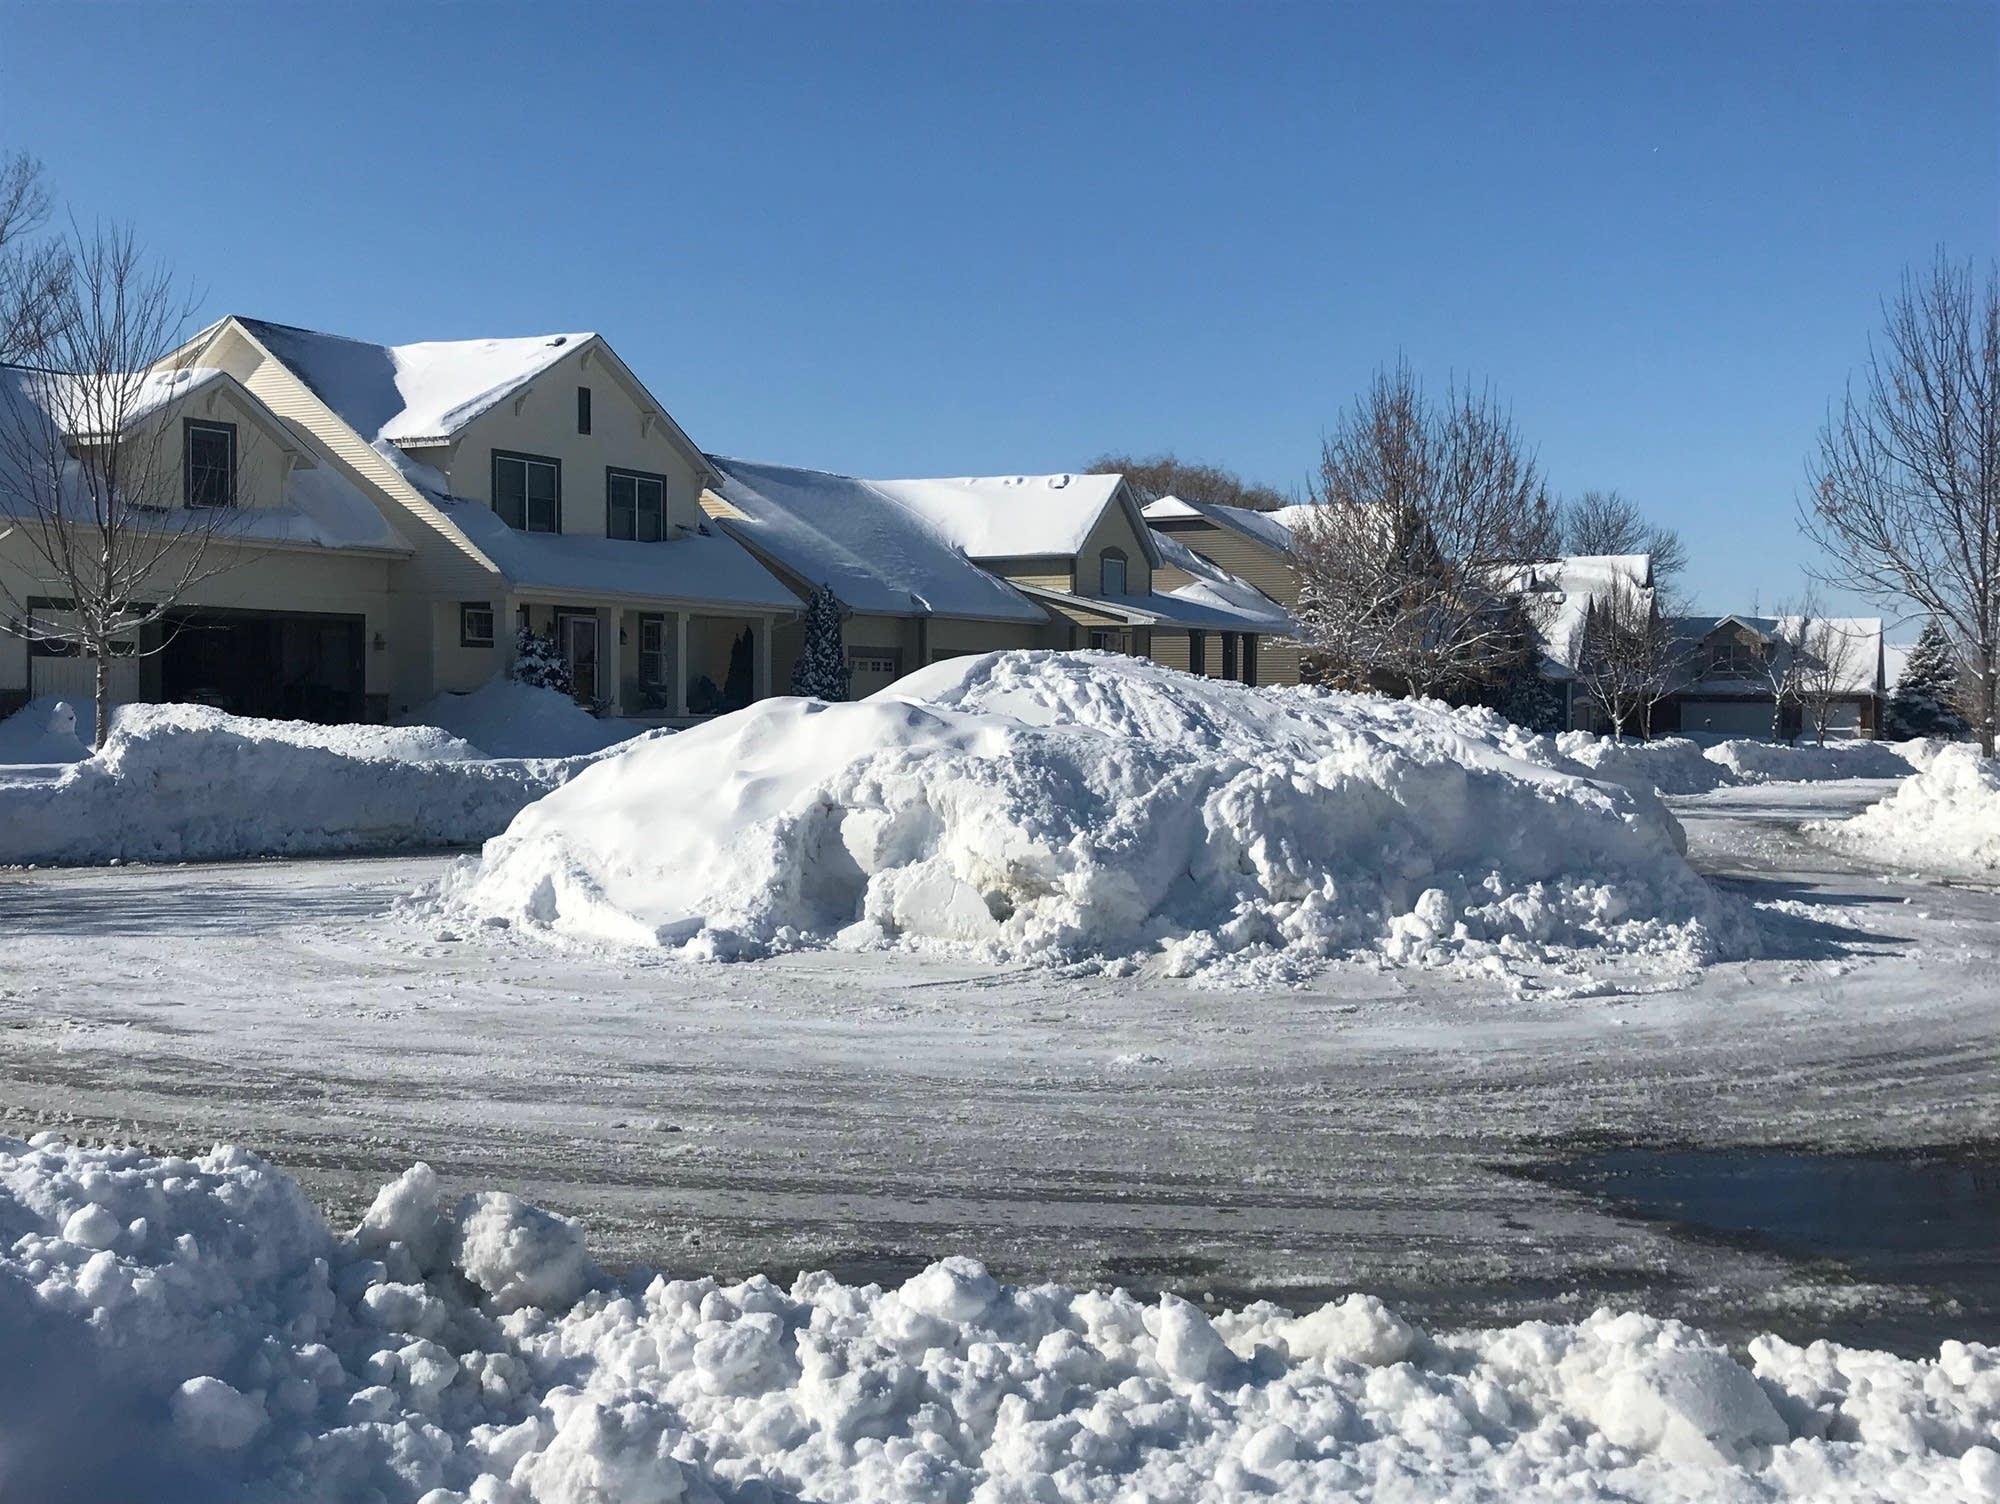 Massive piles of snow line a street in Chaska, Minn.